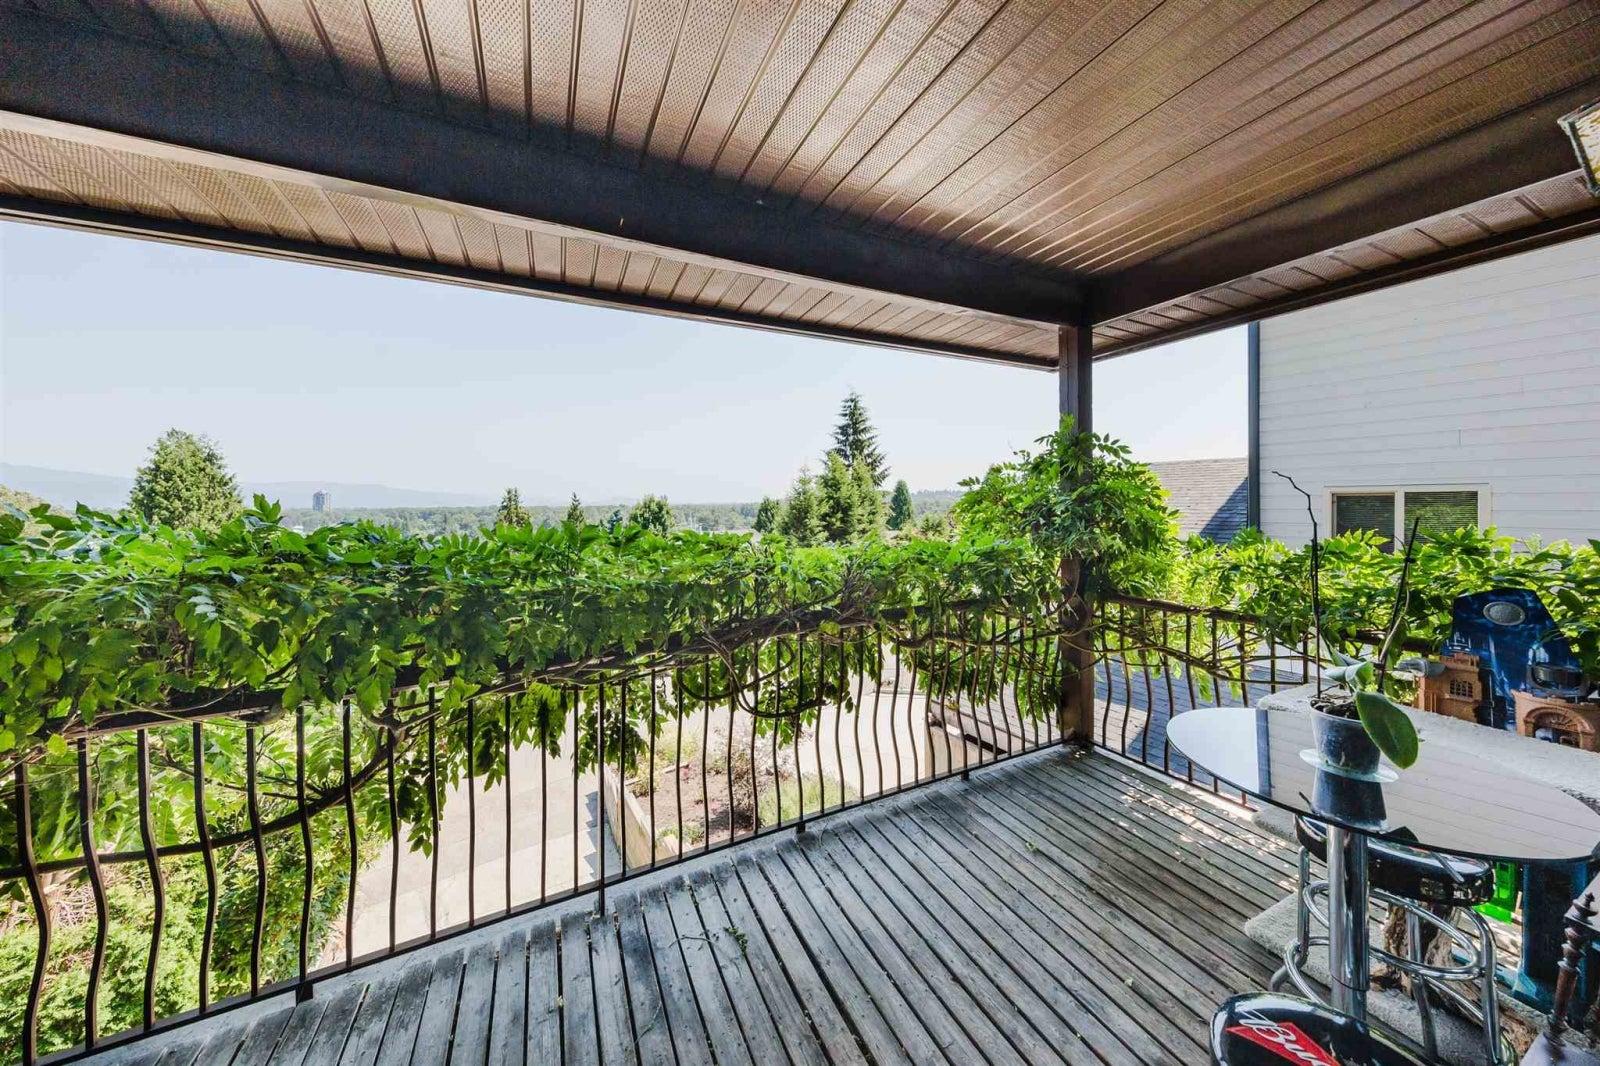 843 REDDINGTON COURT - Ranch Park House/Single Family for sale, 5 Bedrooms (R2602360) #2